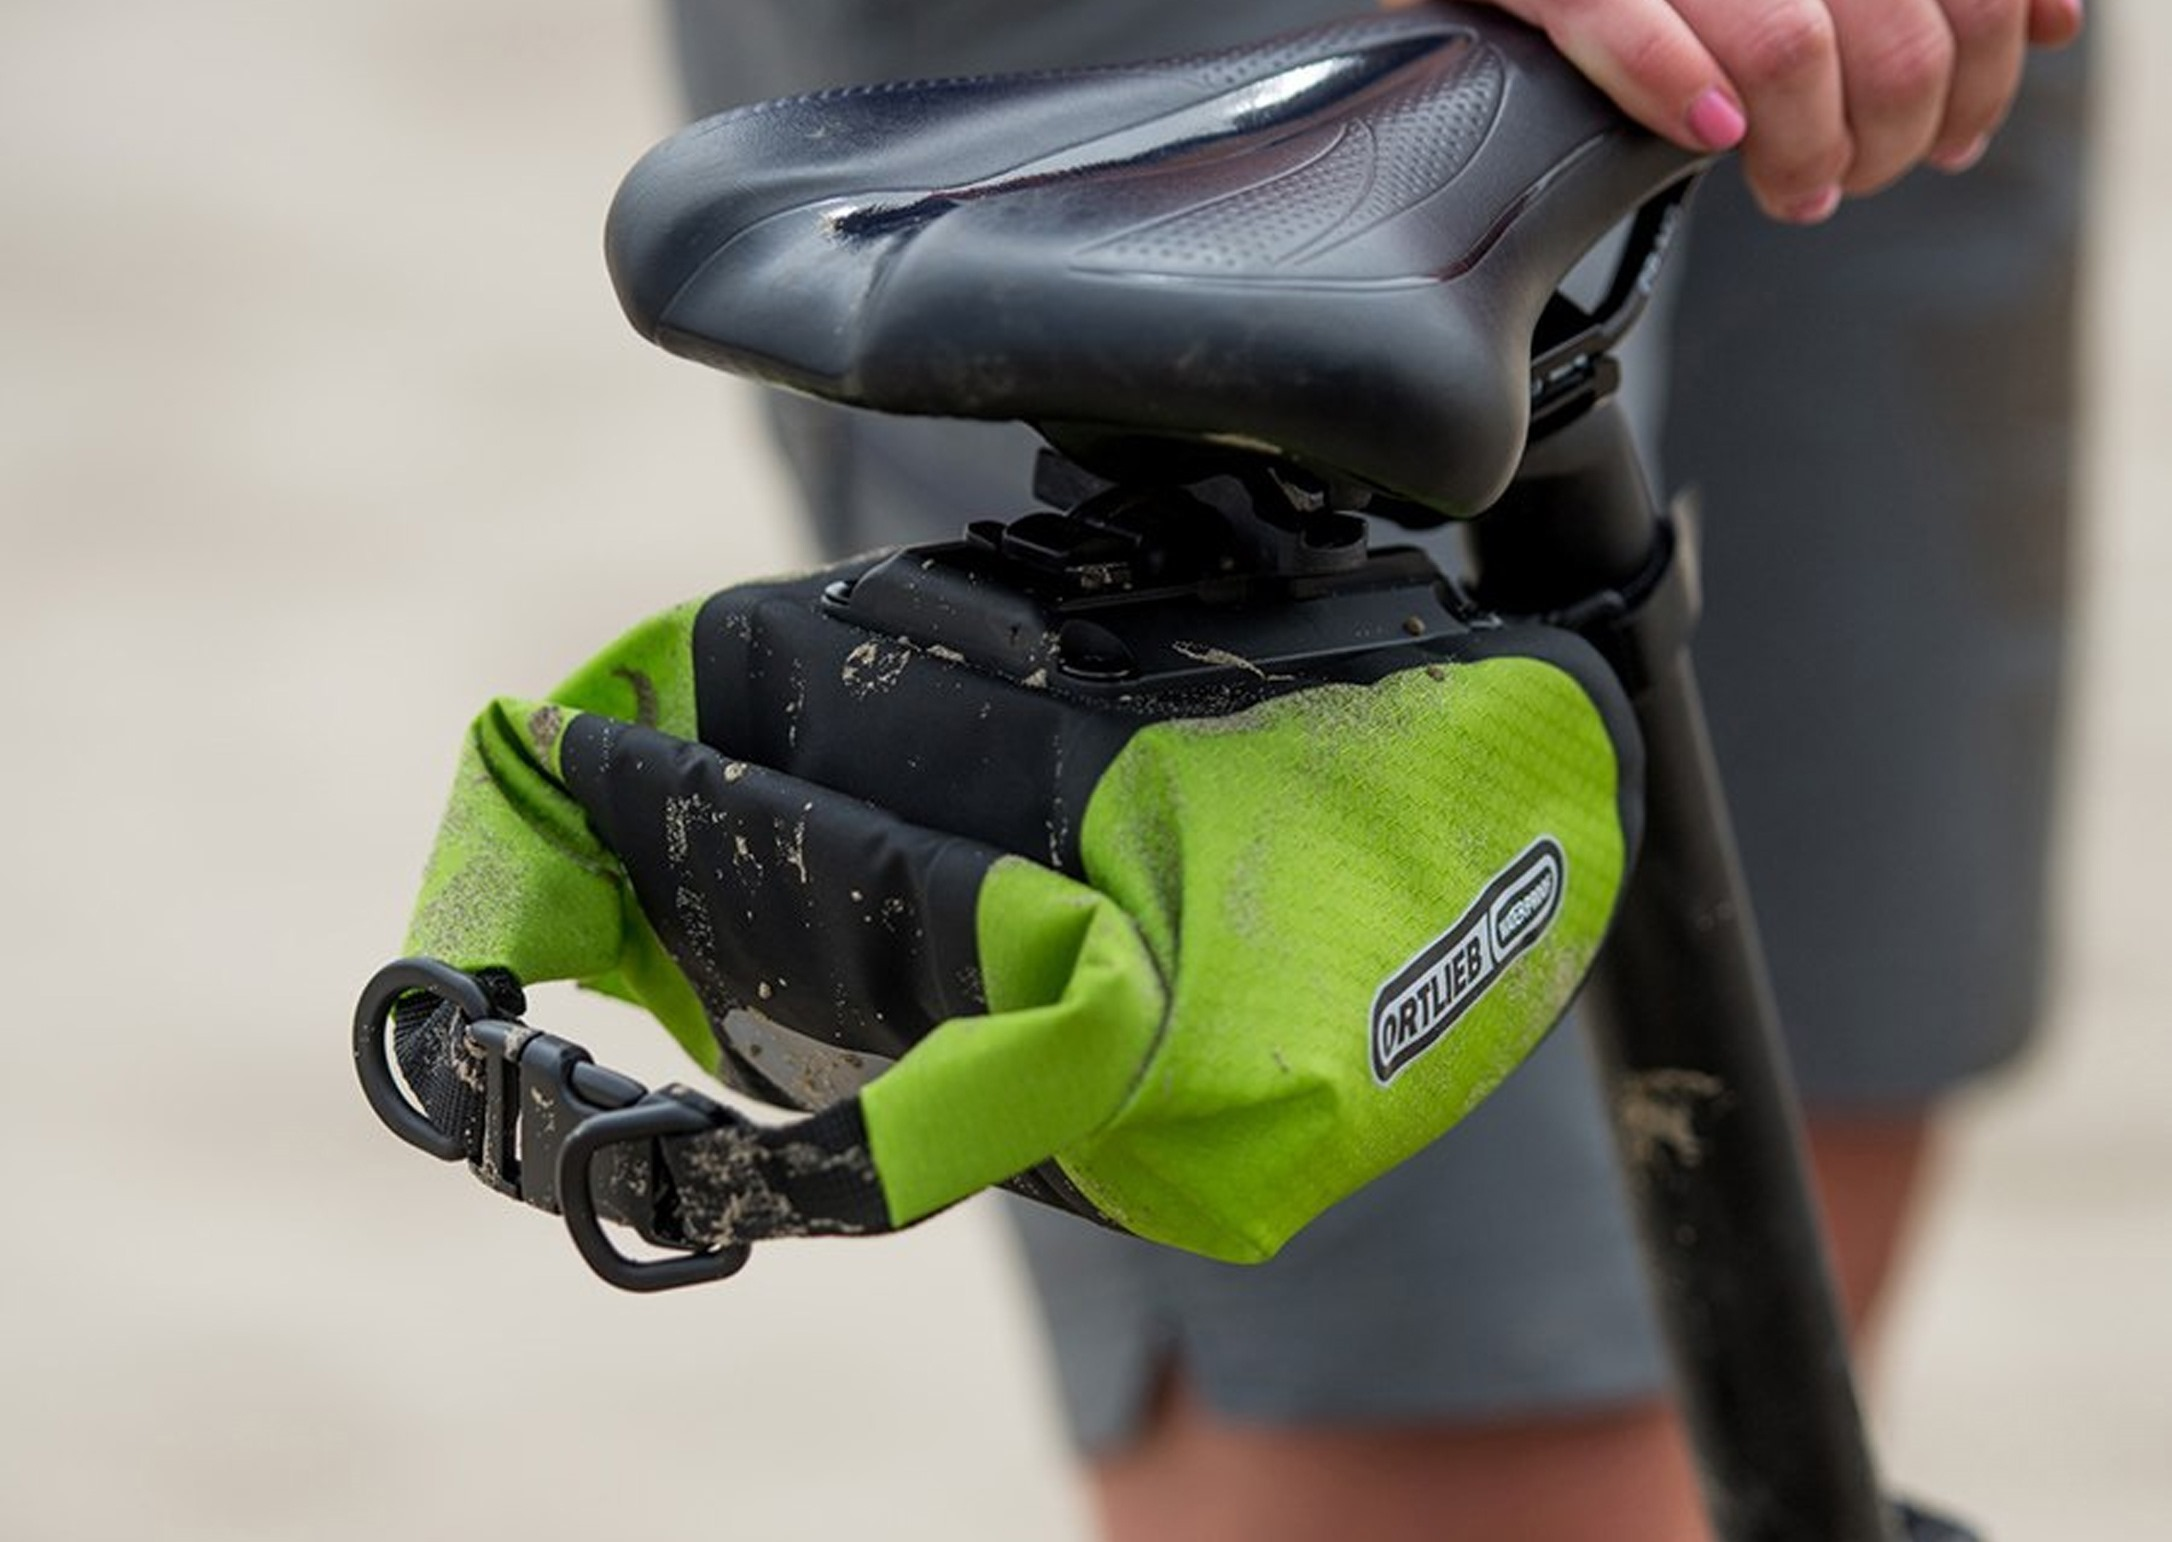 bike-bag-luggage-pannier-ortlieb-tou[12]